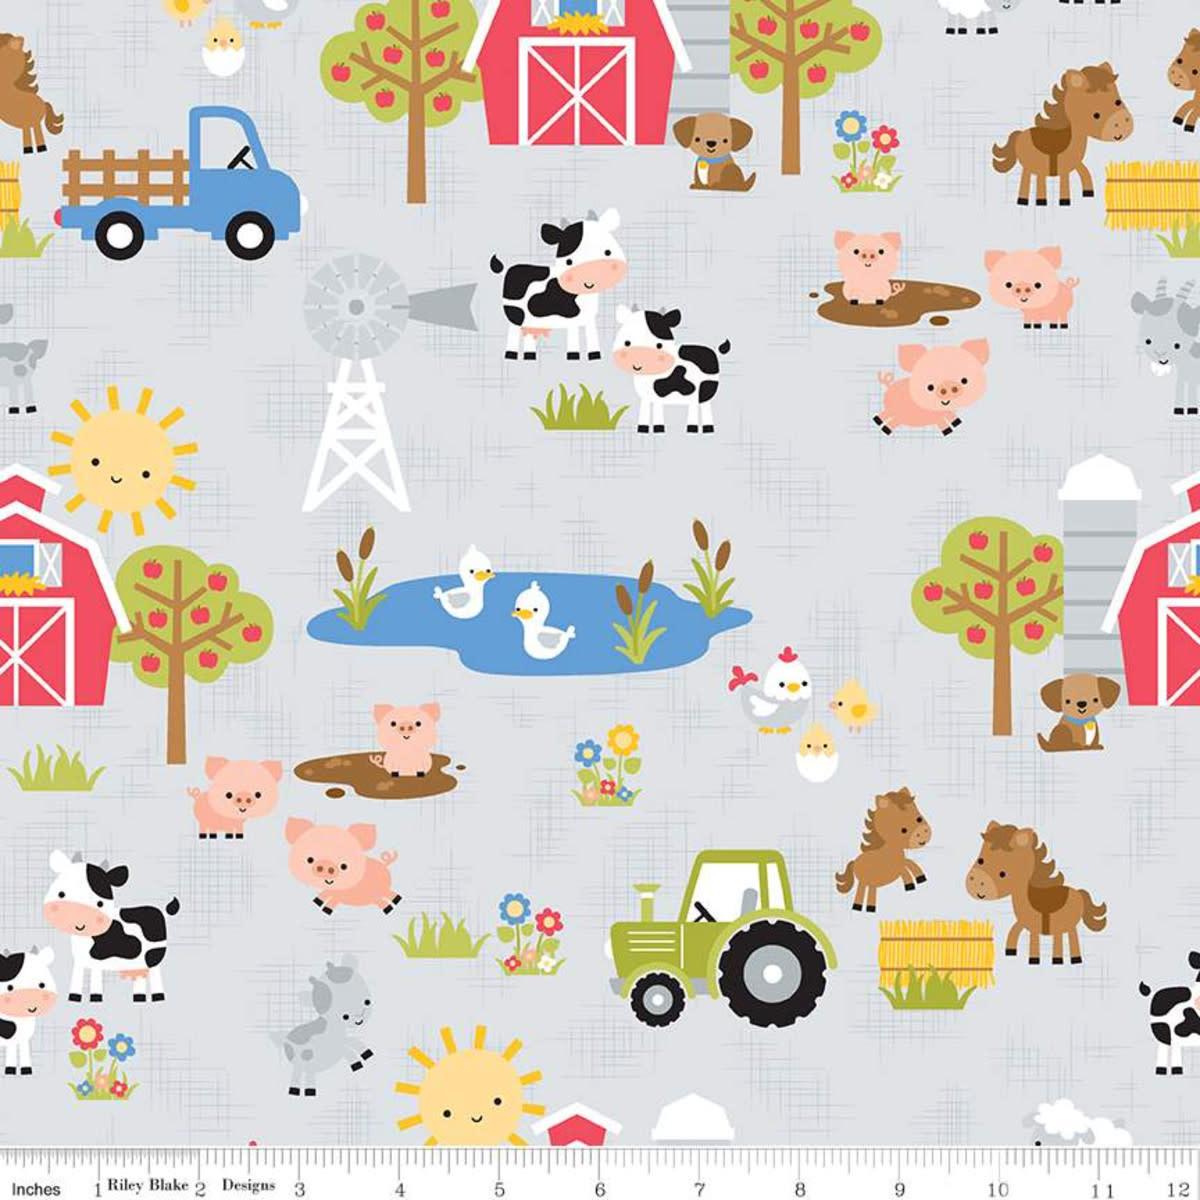 RILEY BLAKE DESIGNS DOWN ON THE FARM, MAIN, GRAY PER CM OR $20/M